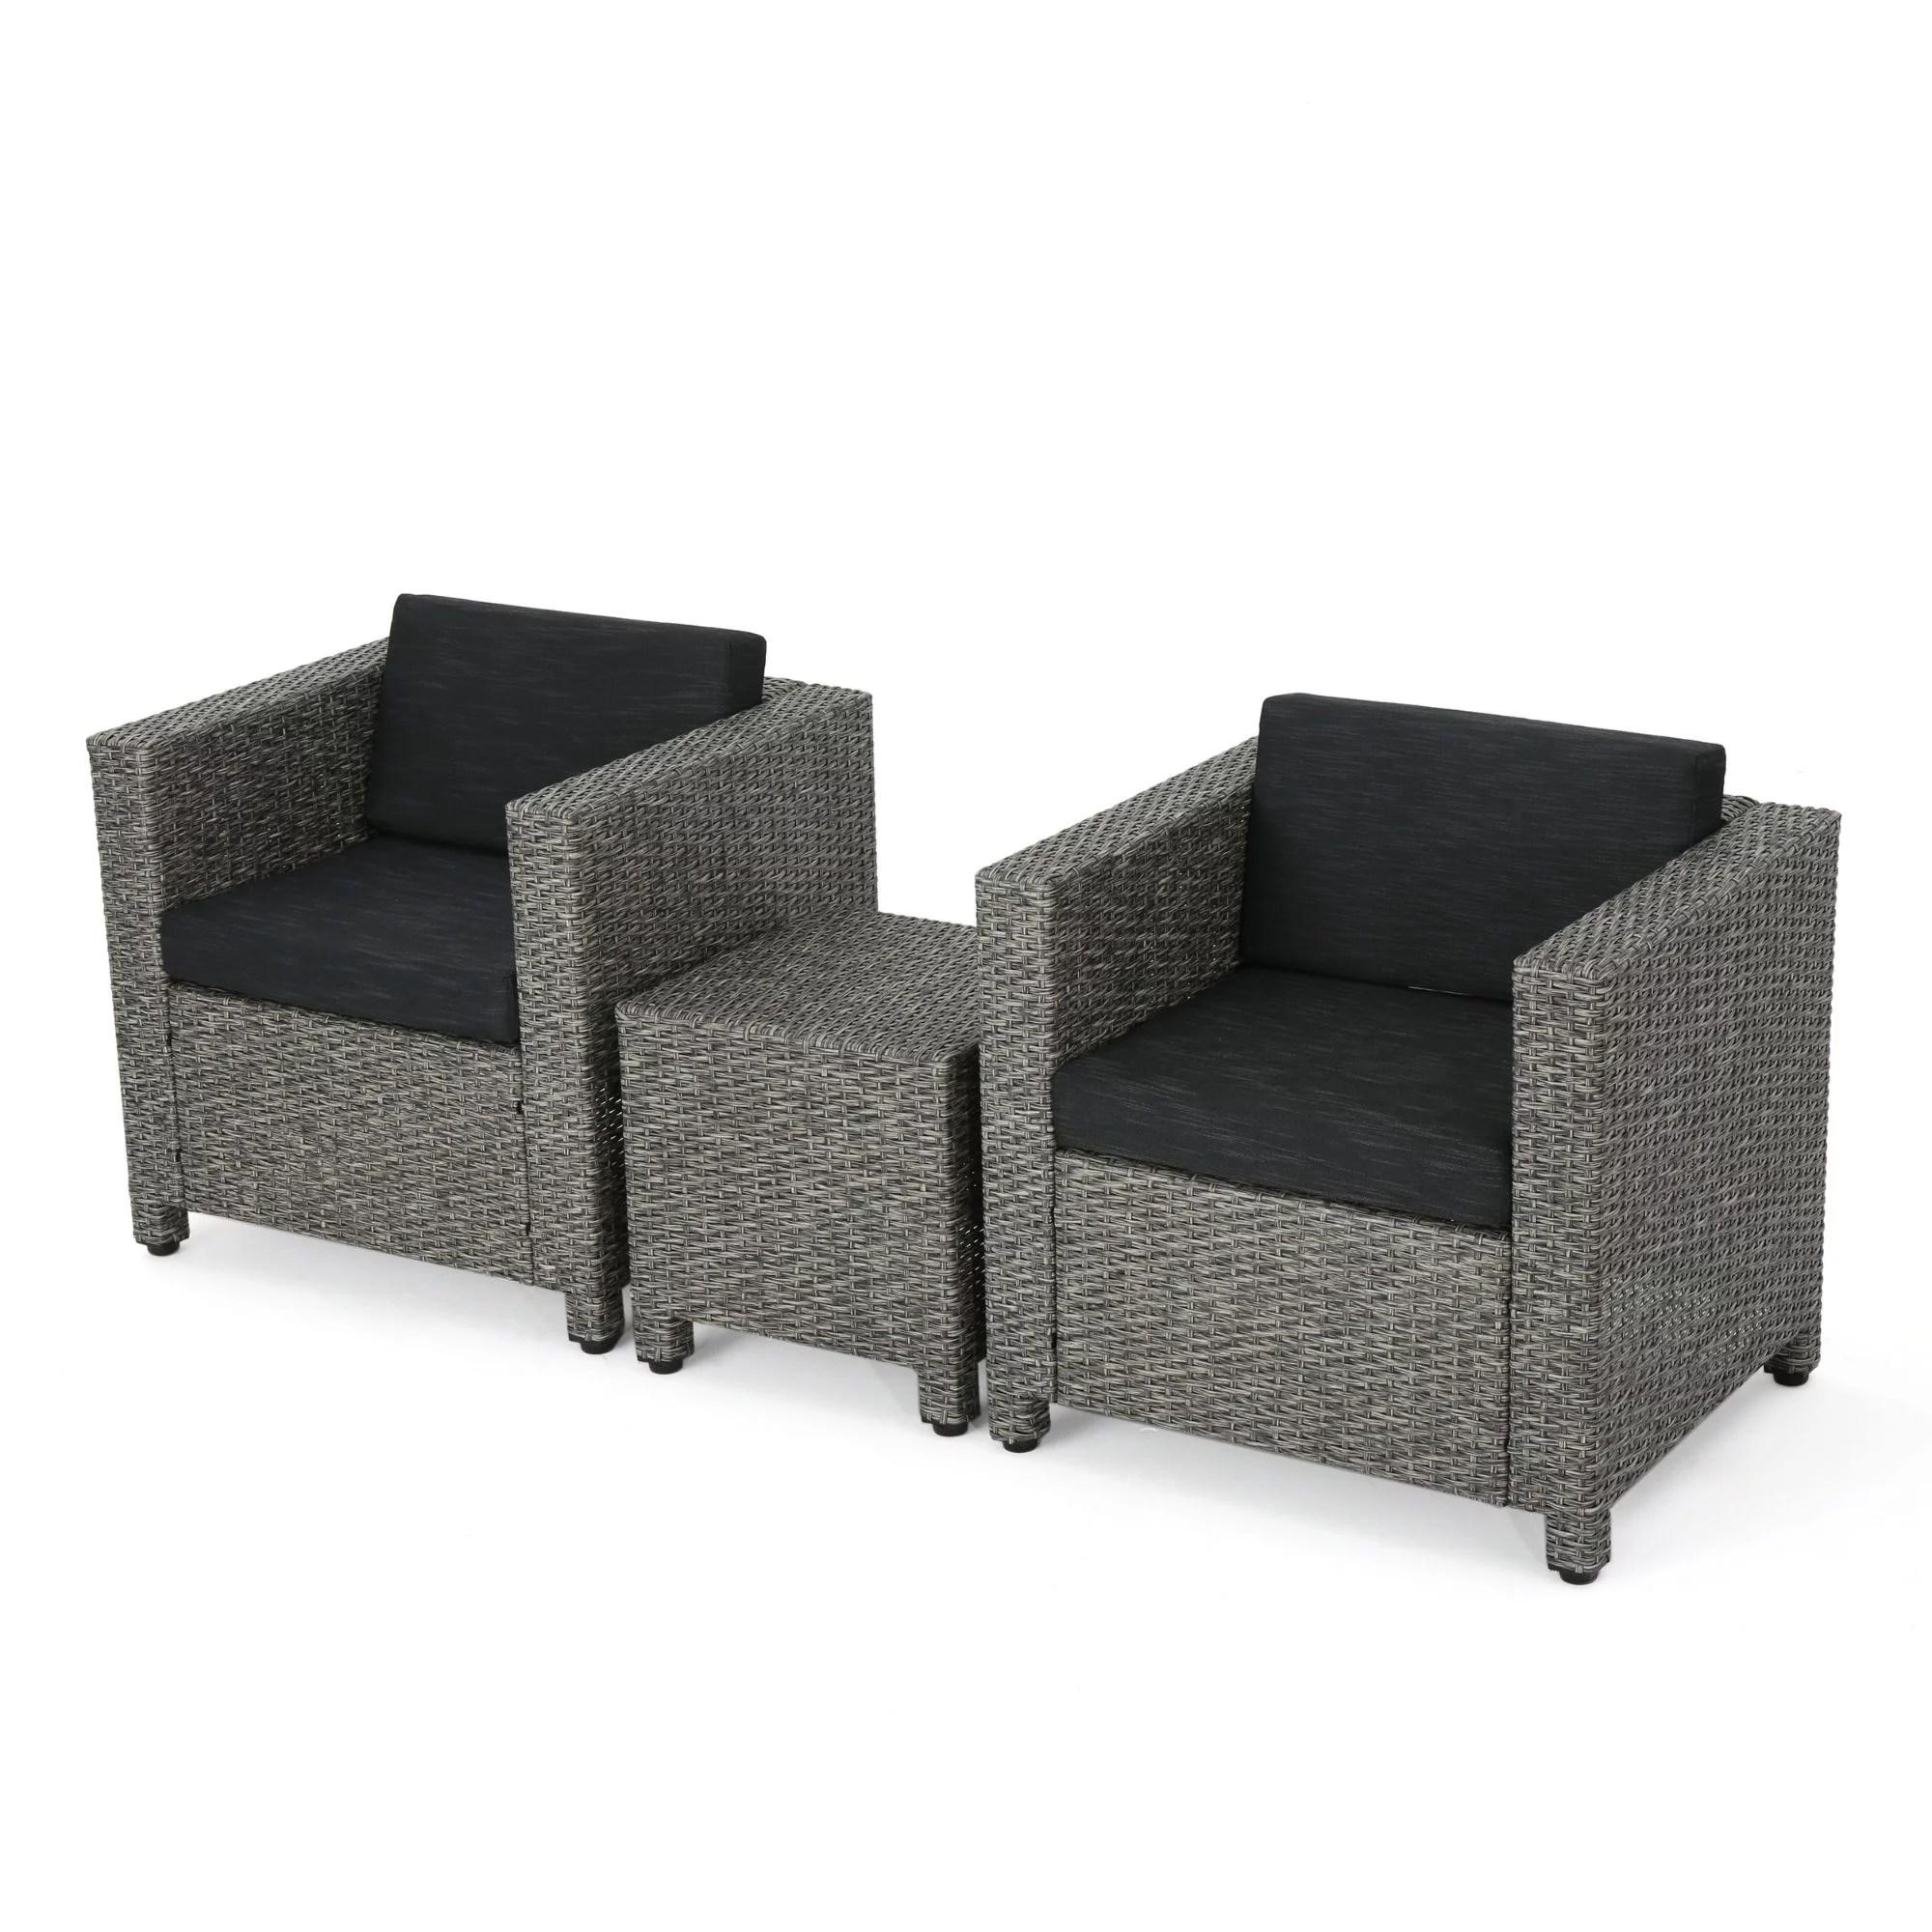 3 piece black finish wicker outdoor furniture patio chat set dark gray cushions walmart com